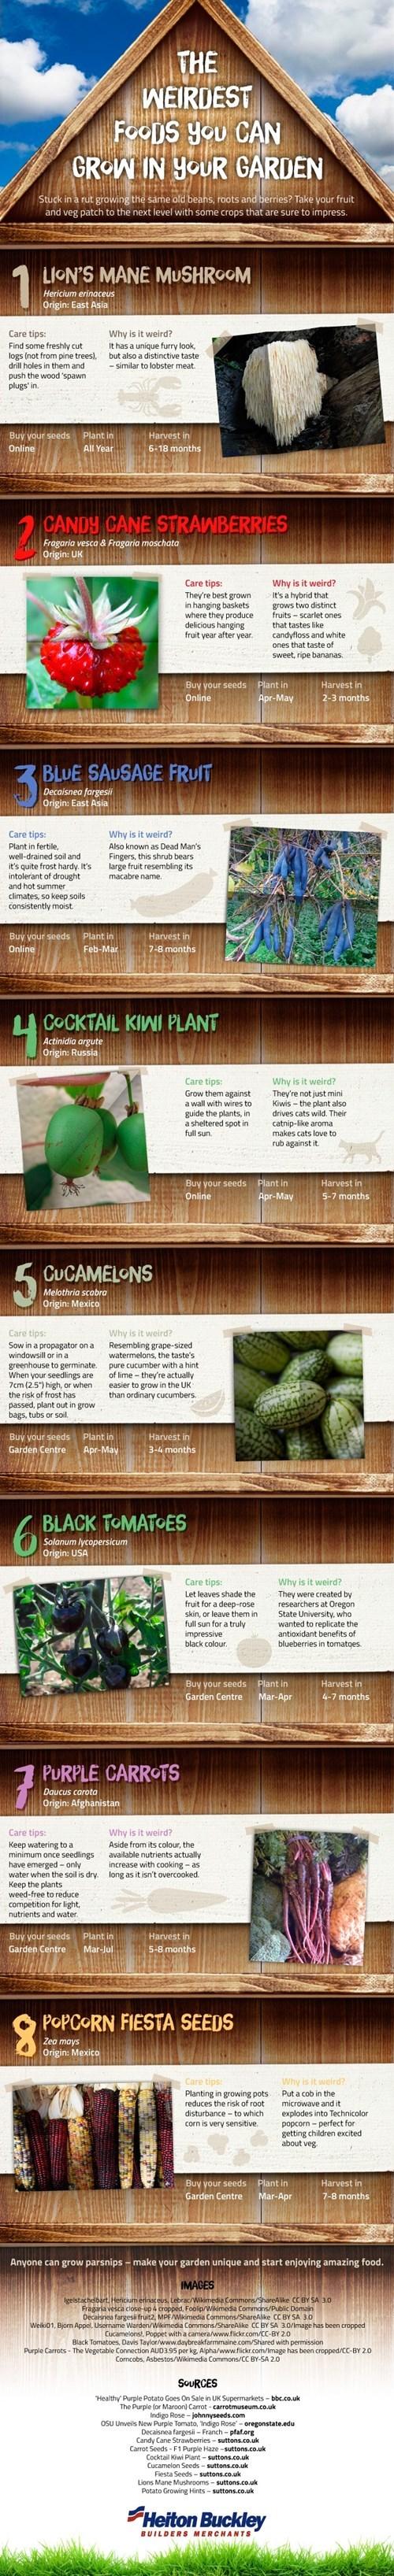 The Weirdest Foods You Can Grow in Your Garden